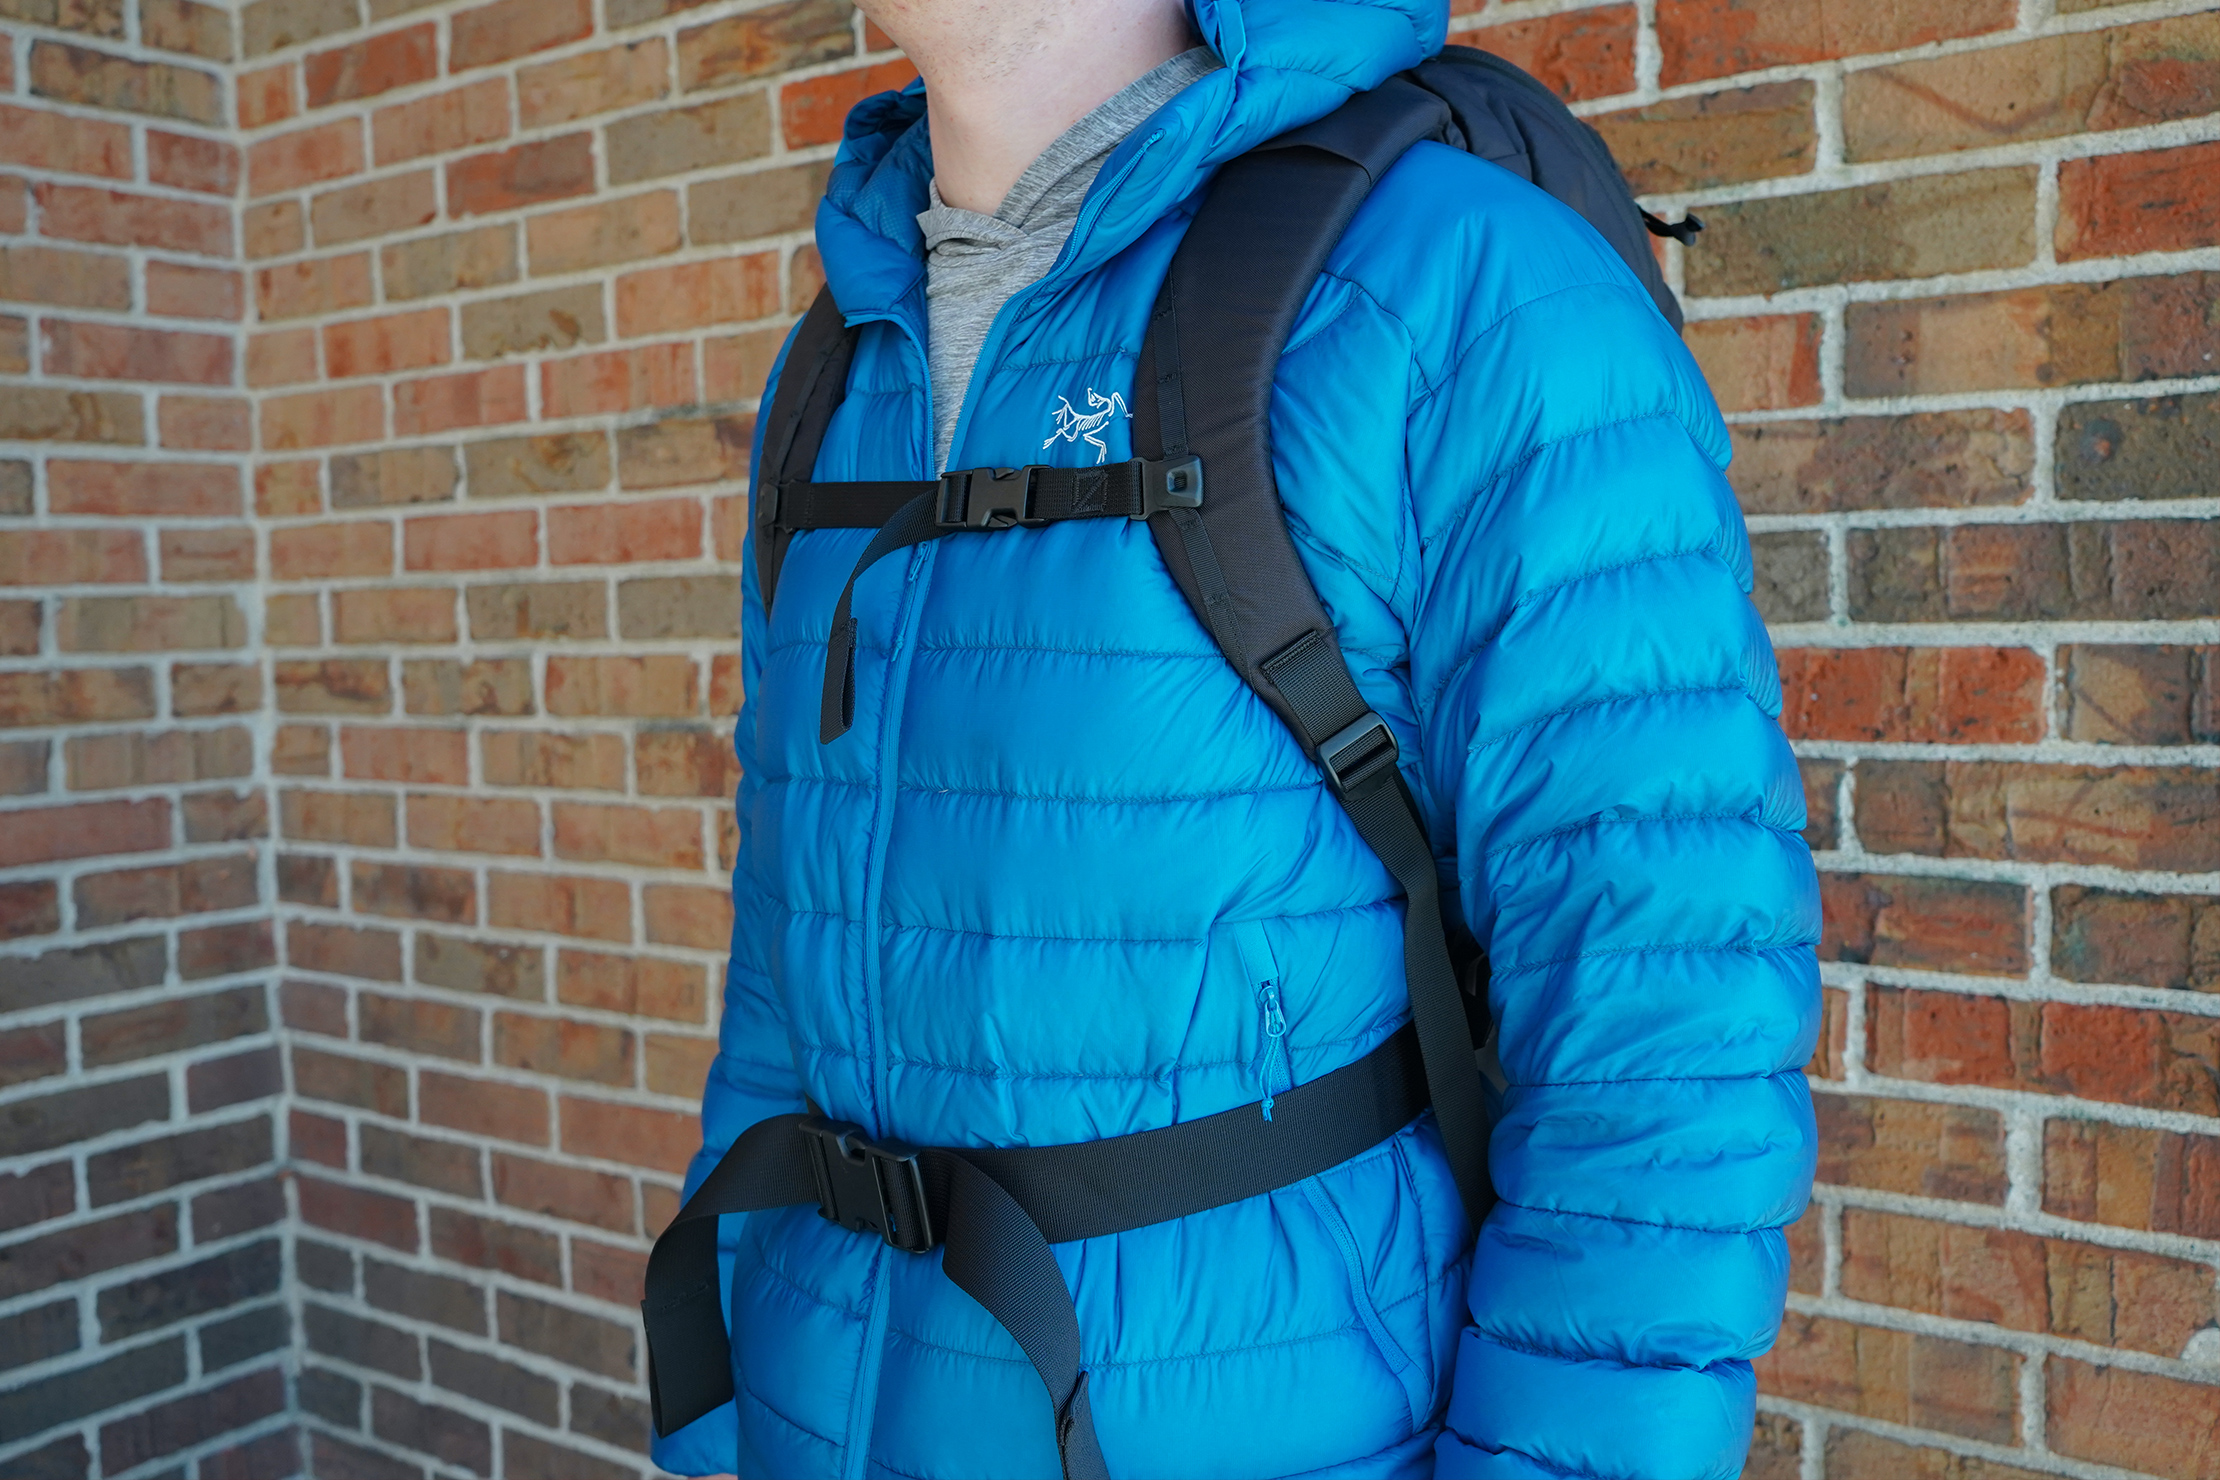 EVERGOODS MPL30 (V2) Harness System